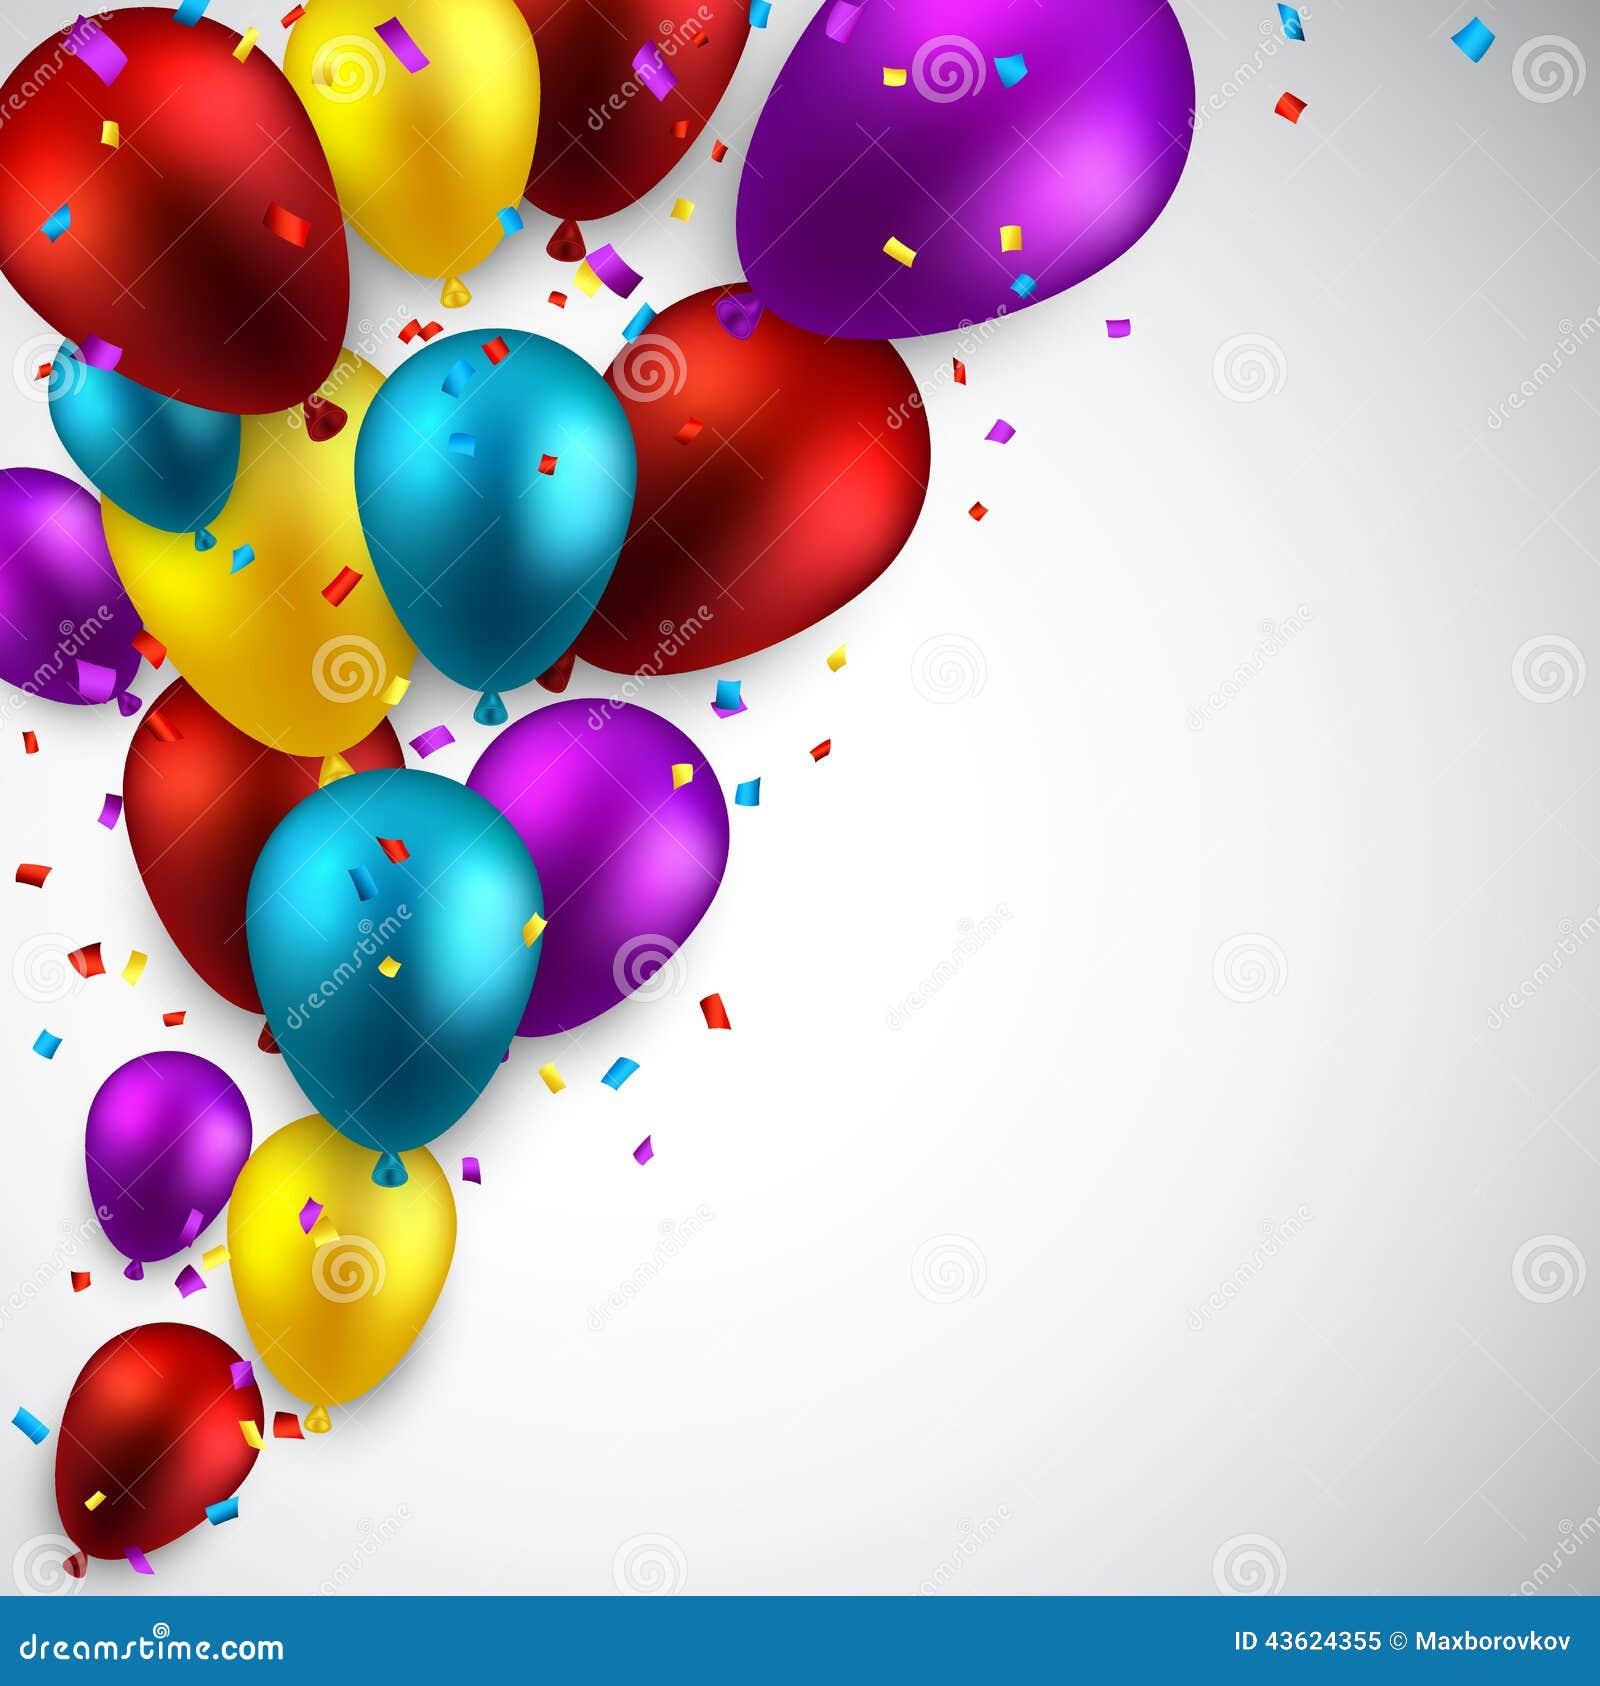 balloons celebration wallpaper - photo #5